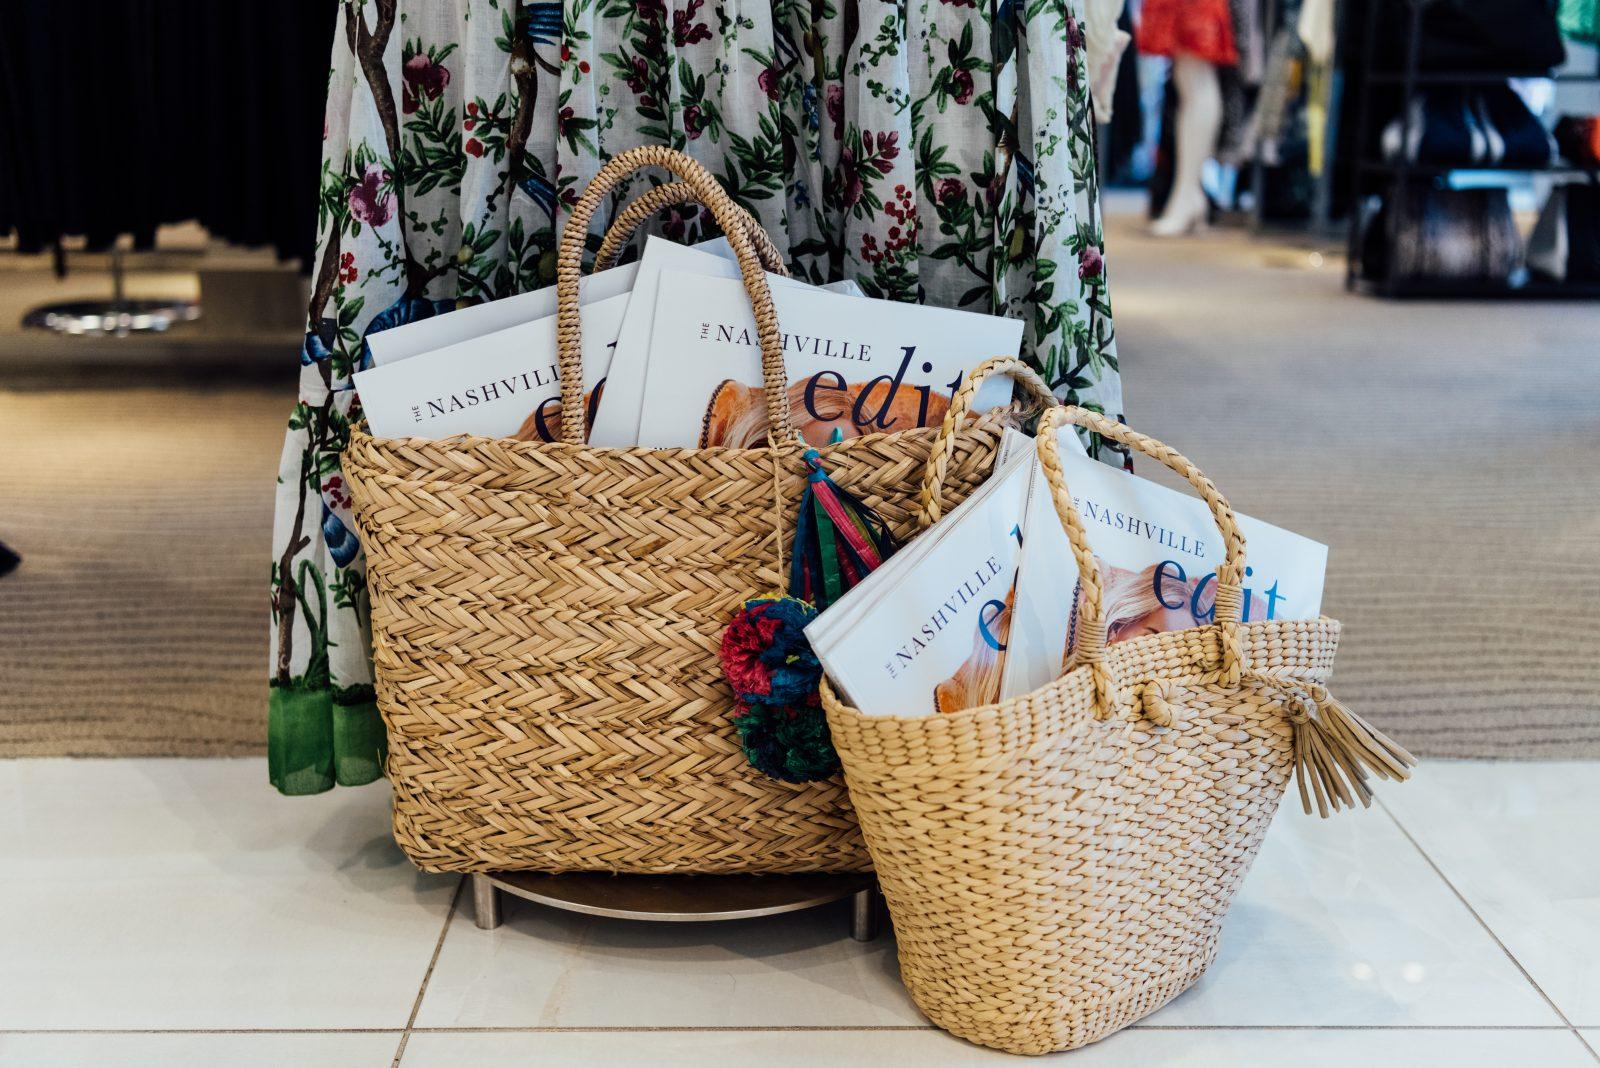 The Nashville Edit copies in woven straw handbags